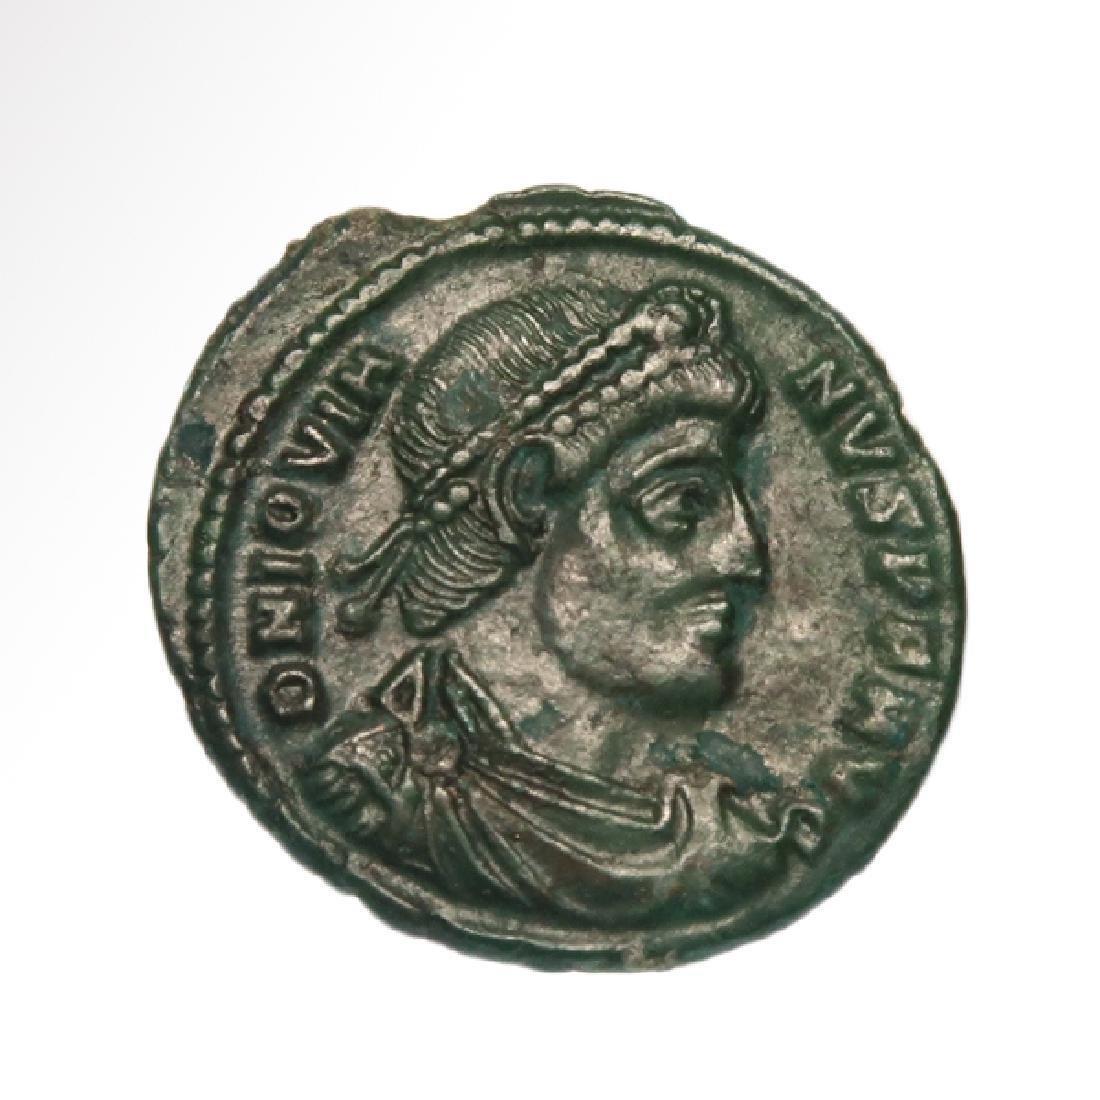 Rare Roman Bronze Coin, Jovian, c. 364-375 A.D.